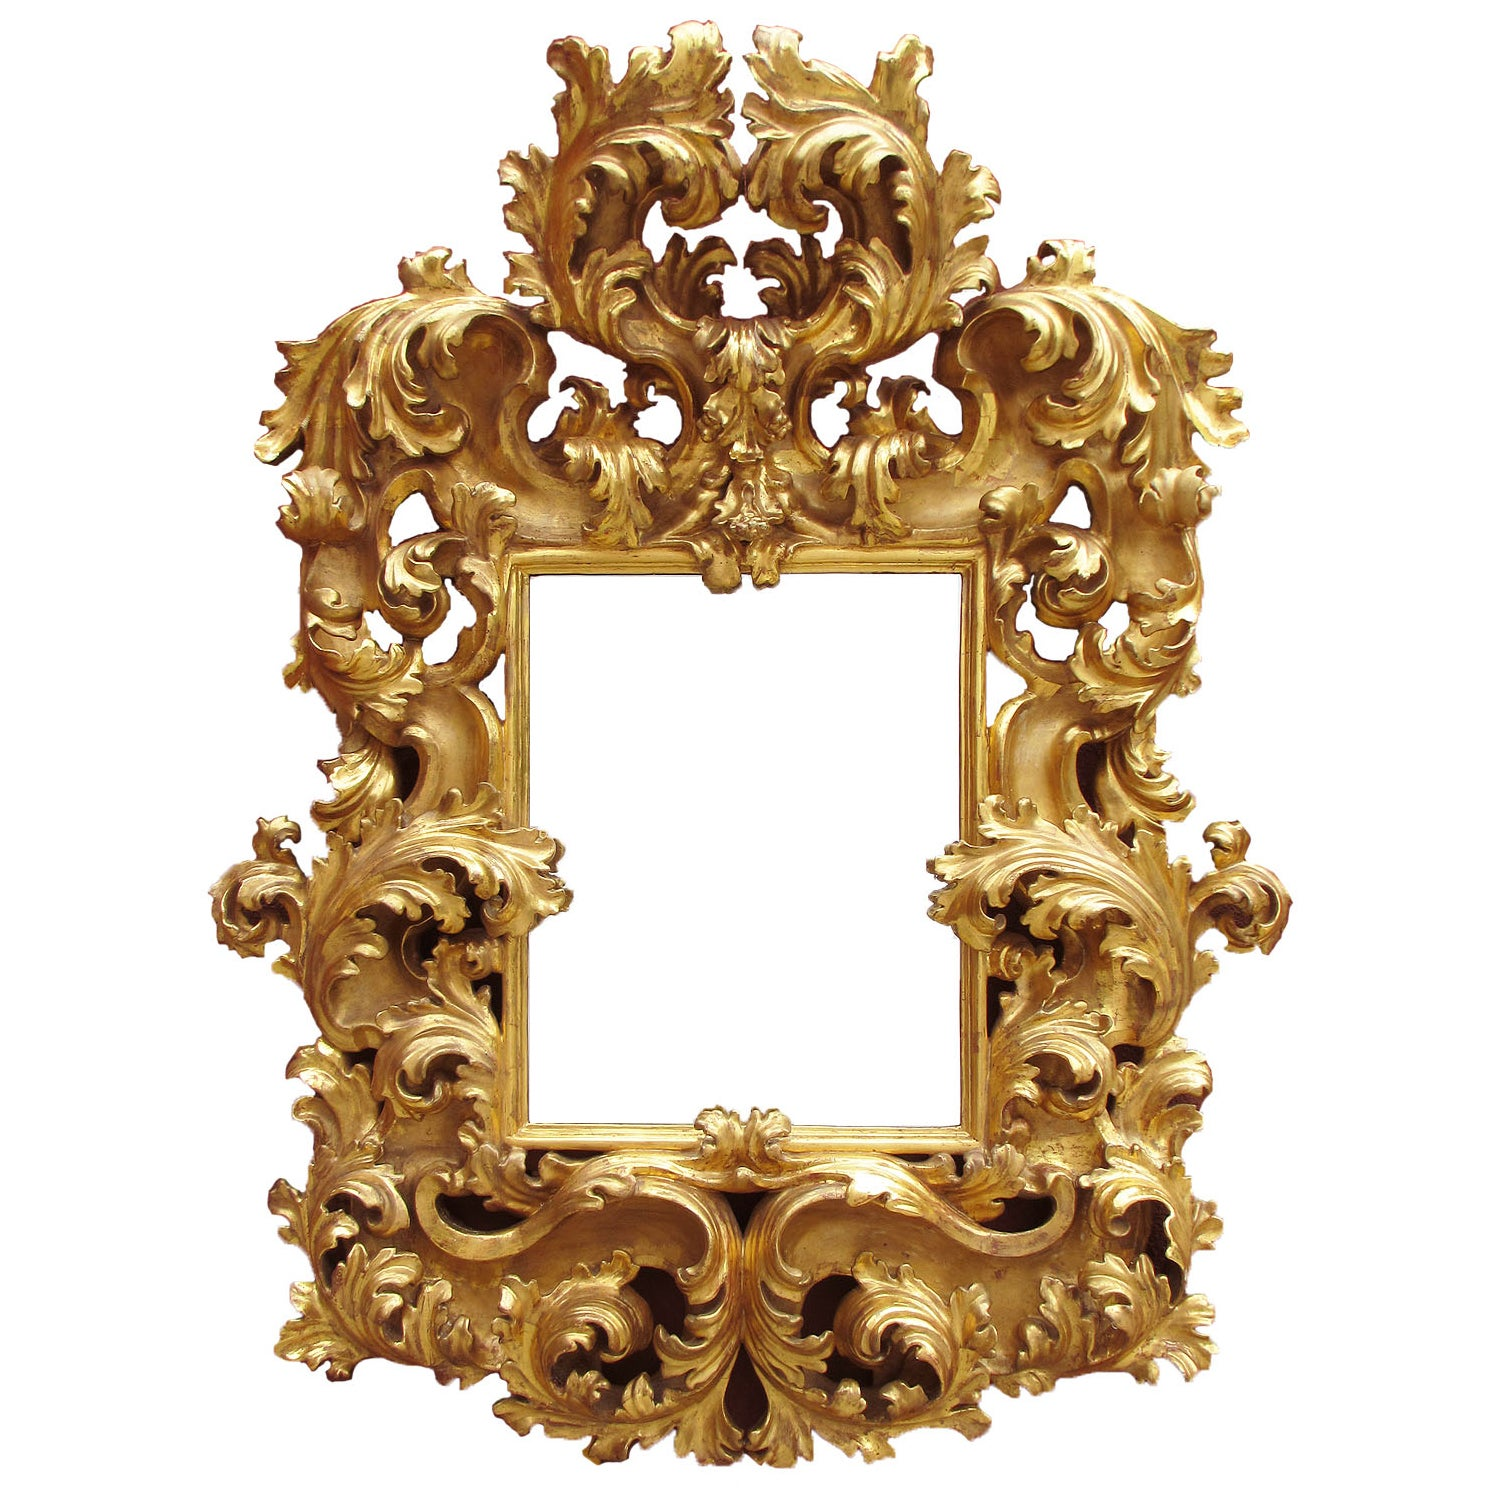 Fine Palatial Italian 19th Century Florentine Giltwood Carved Mirror Frame